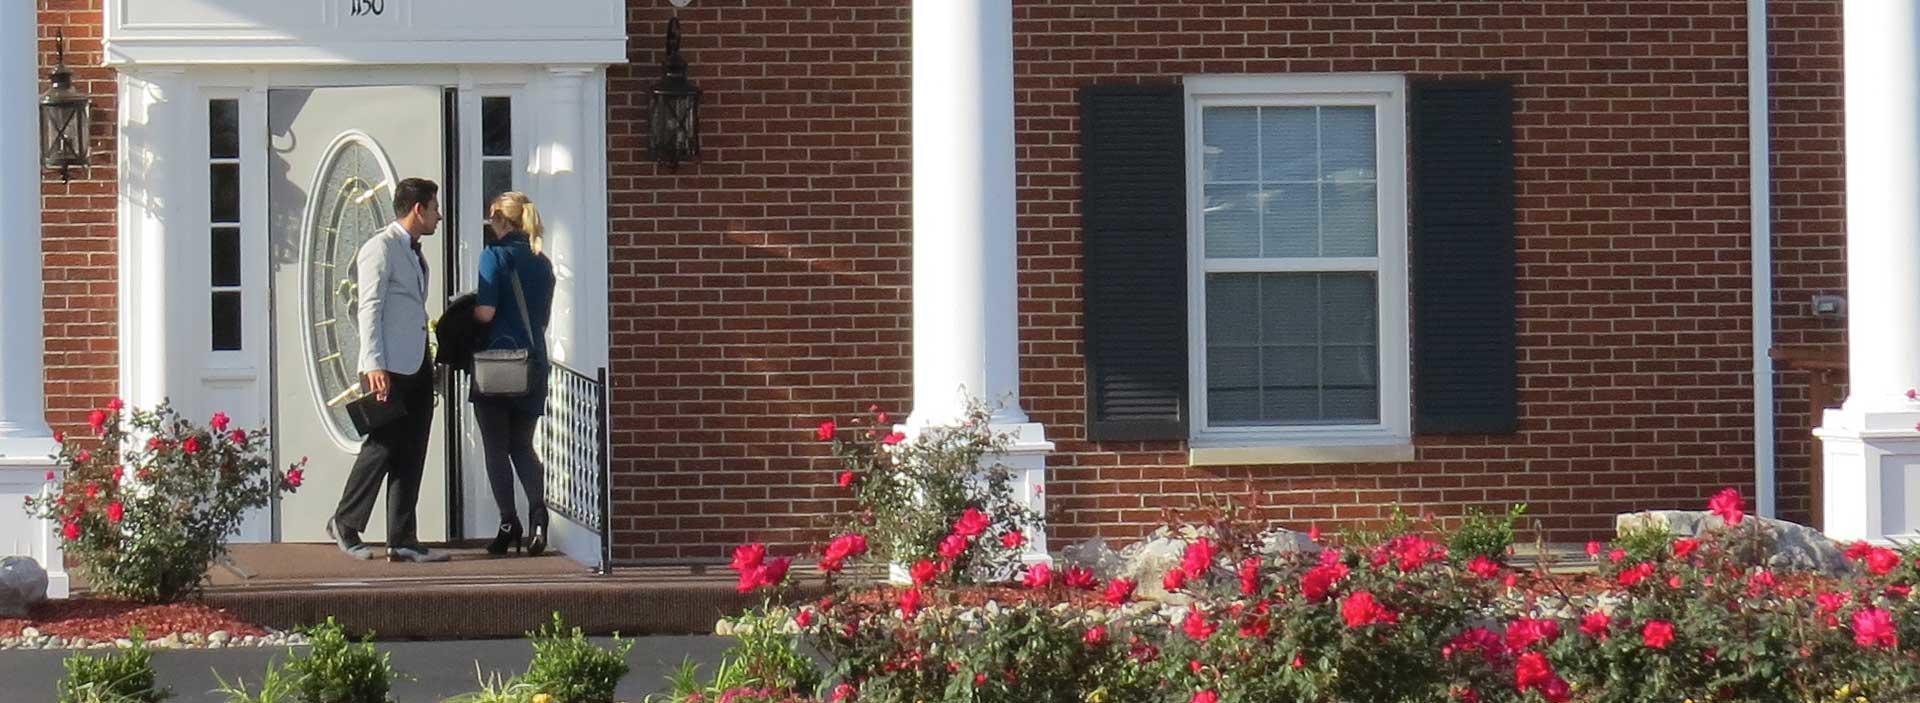 Harrodsburg Conover Education Center image 4